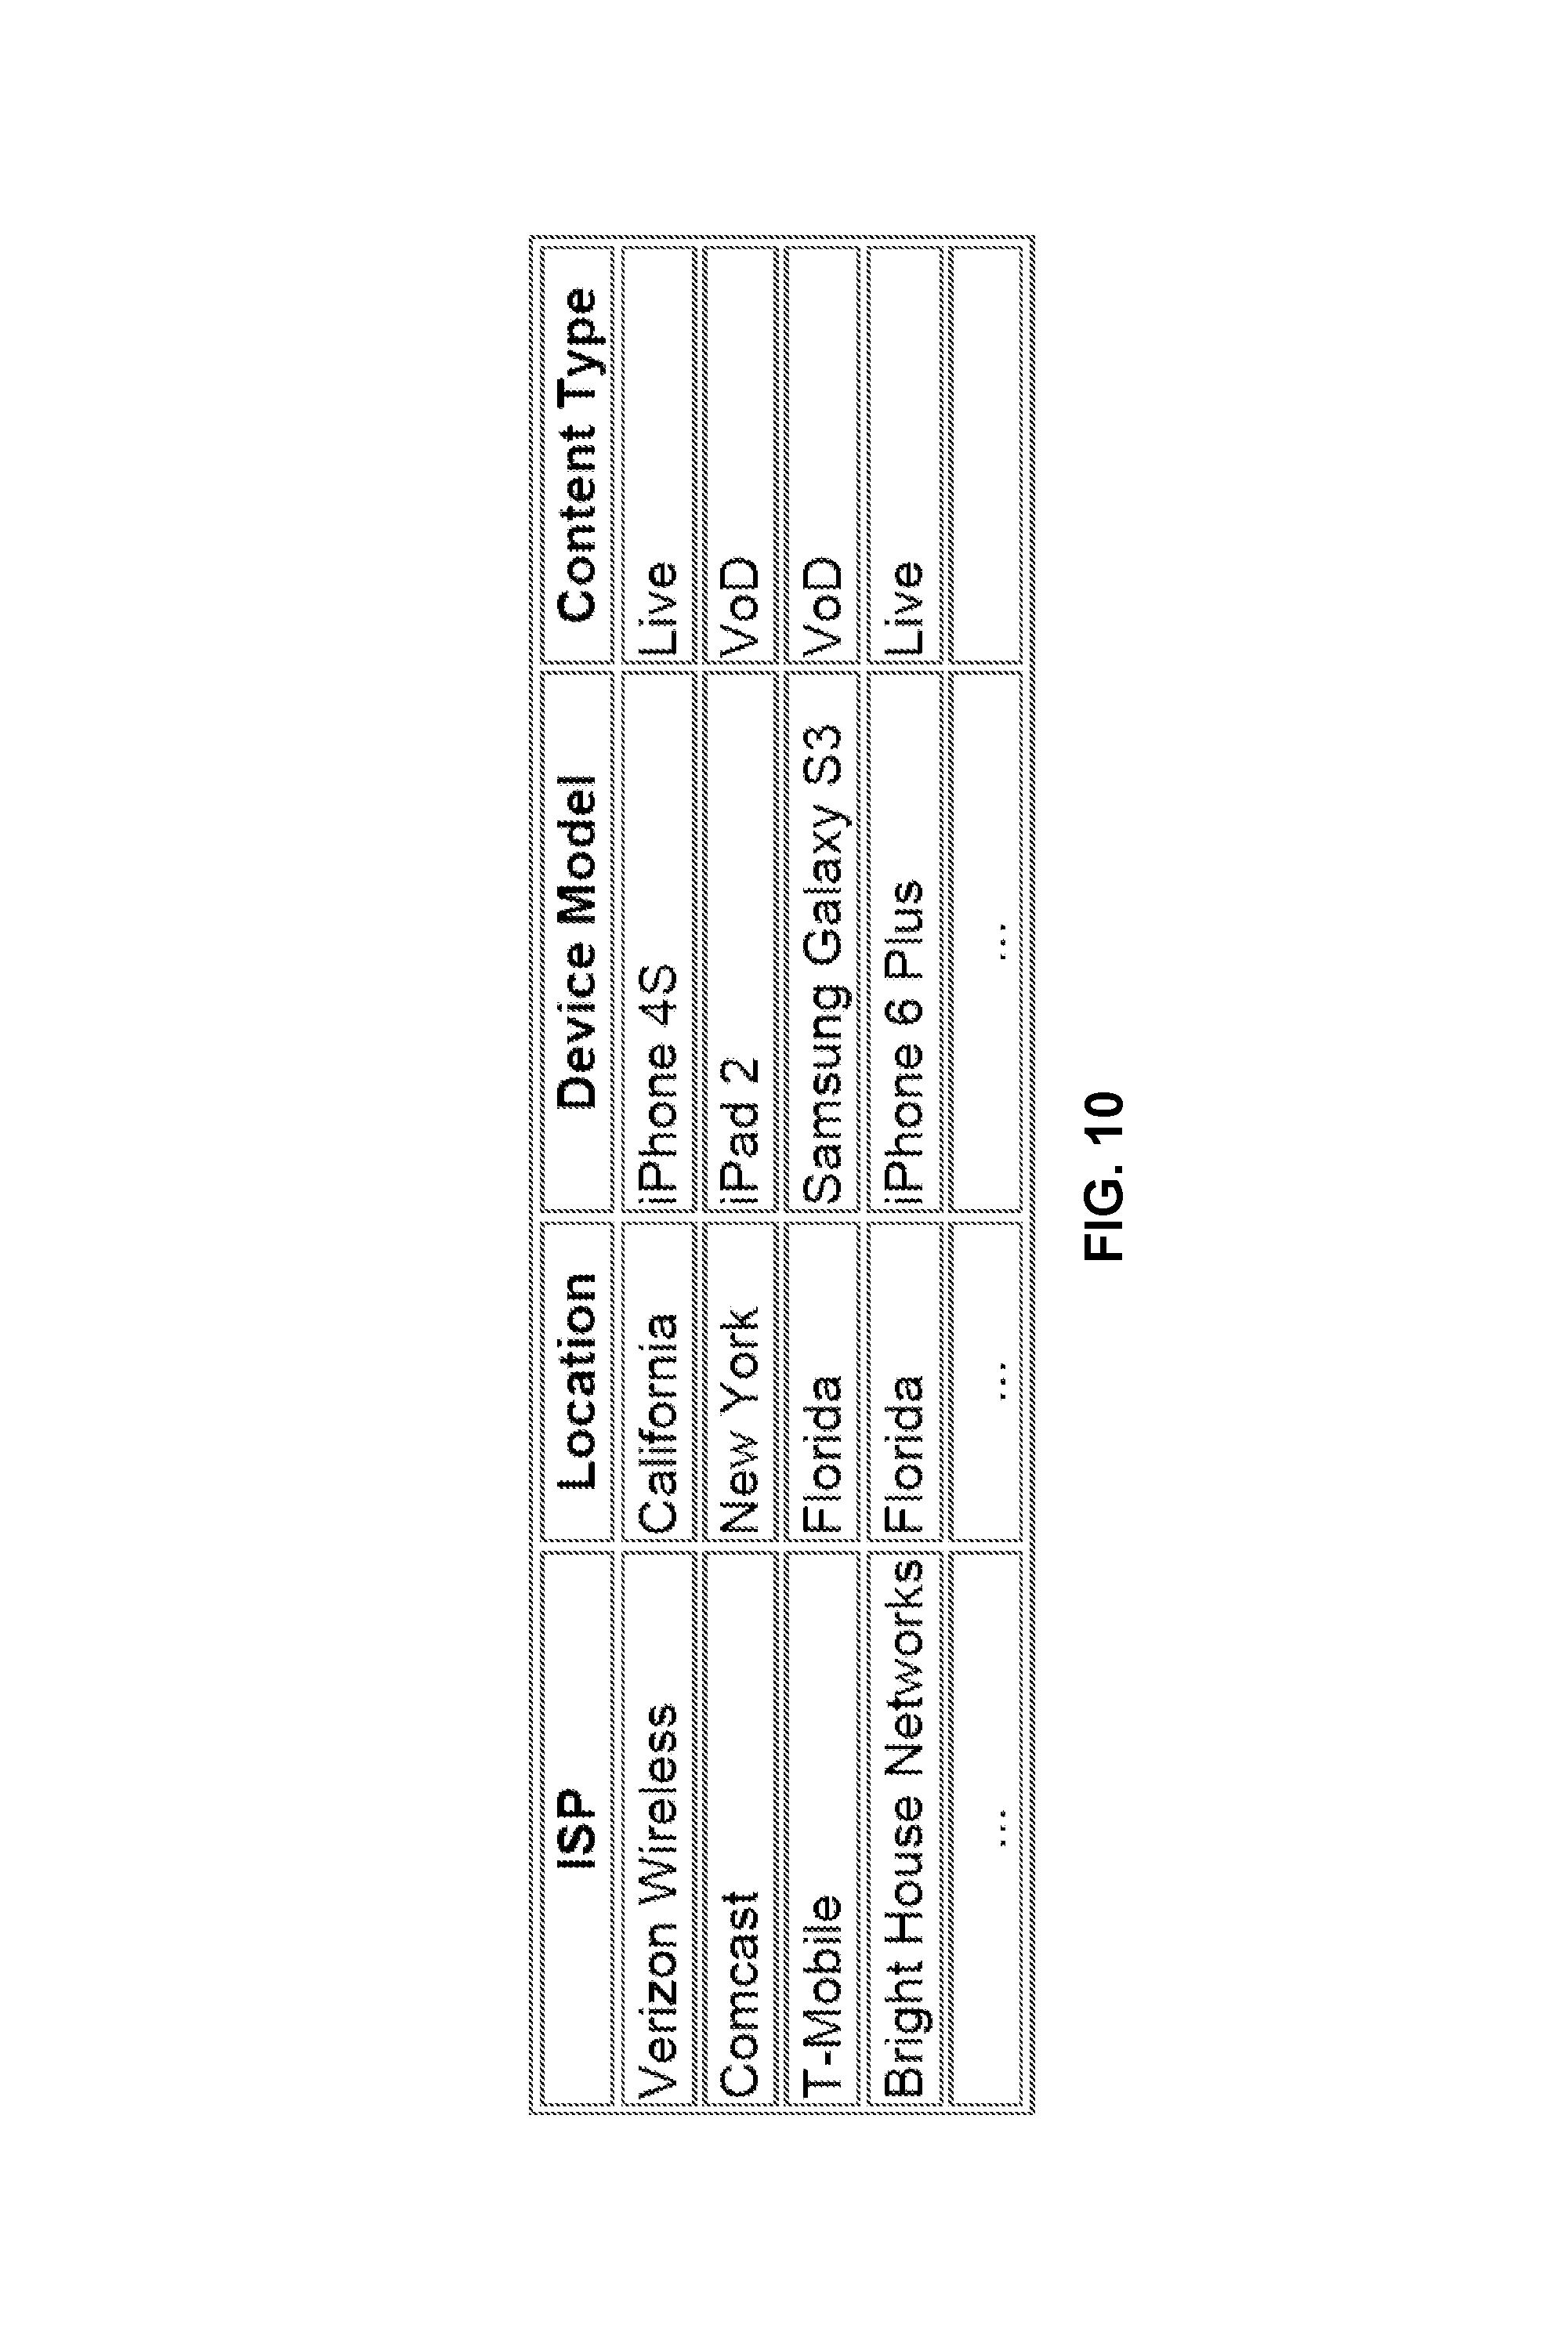 Patent US 10,178,043 B1